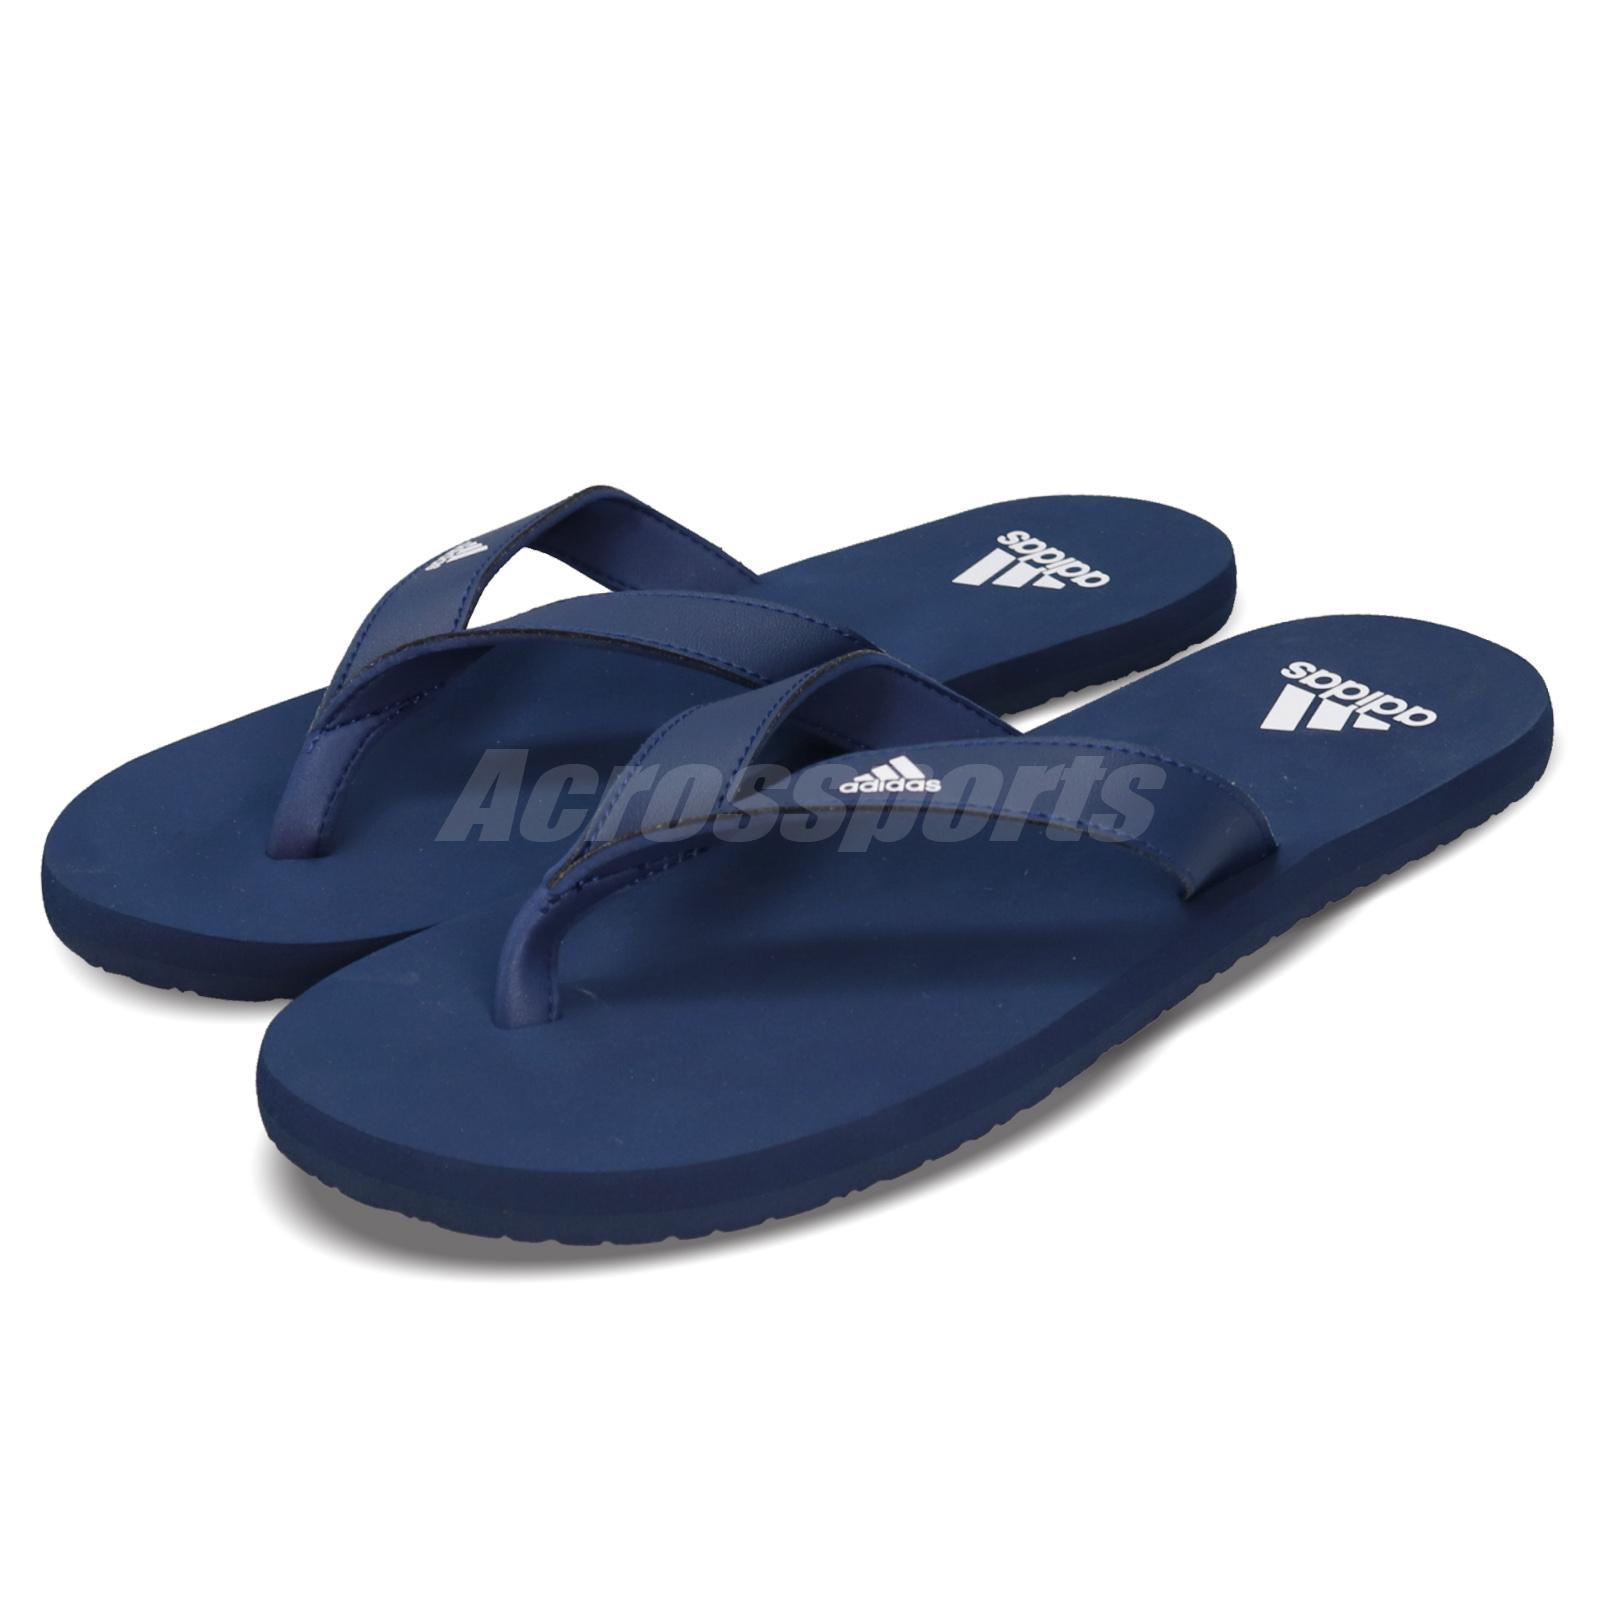 71b20674e Details about adidas Eezay Flip Flop Dark Blue White Men Sports Sandals  Slides Slippers F35028